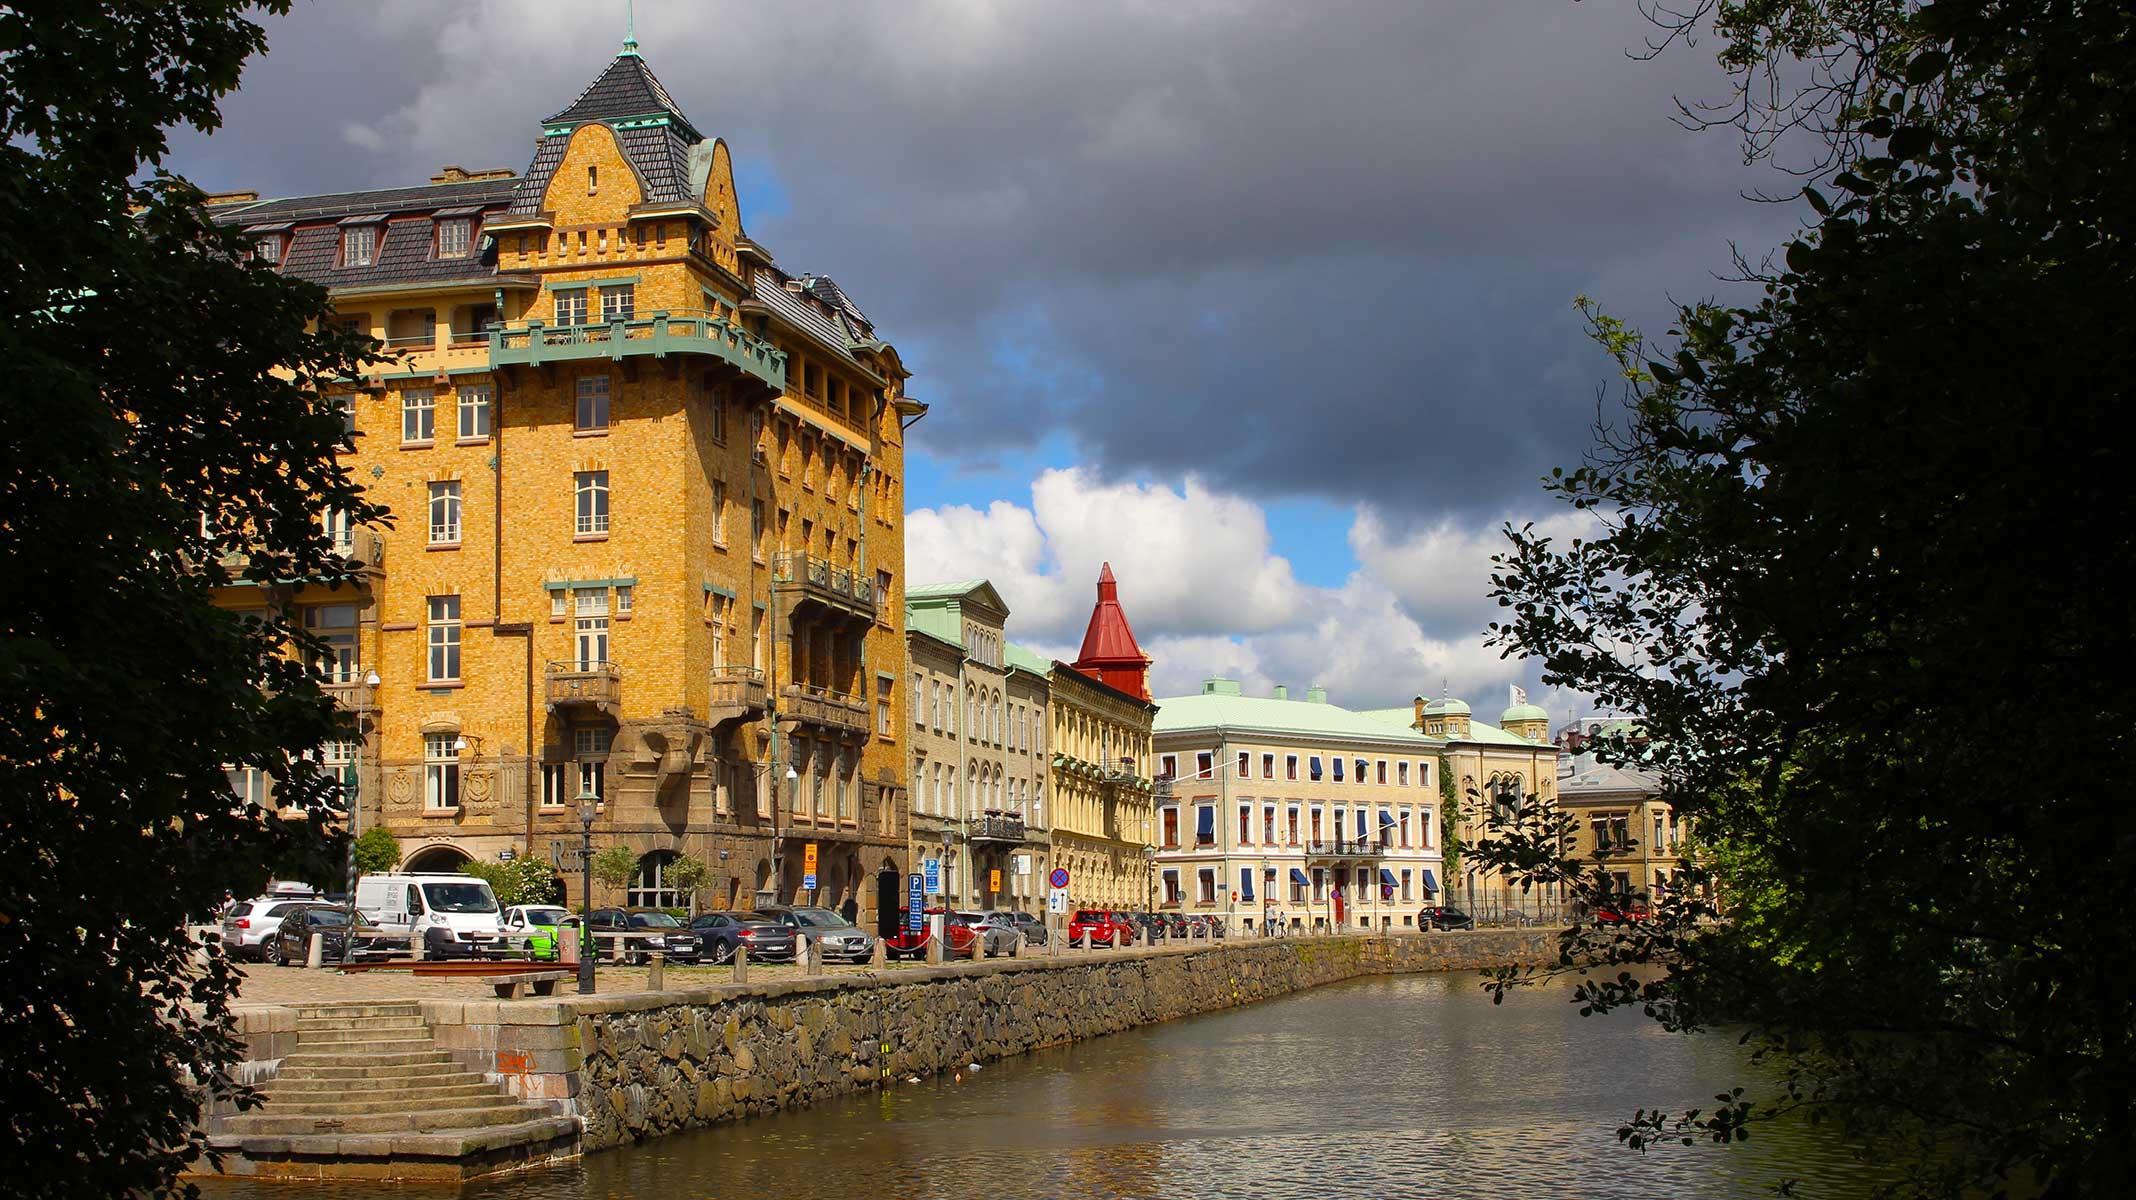 Gothenburg, Sweden. Canal through the city.